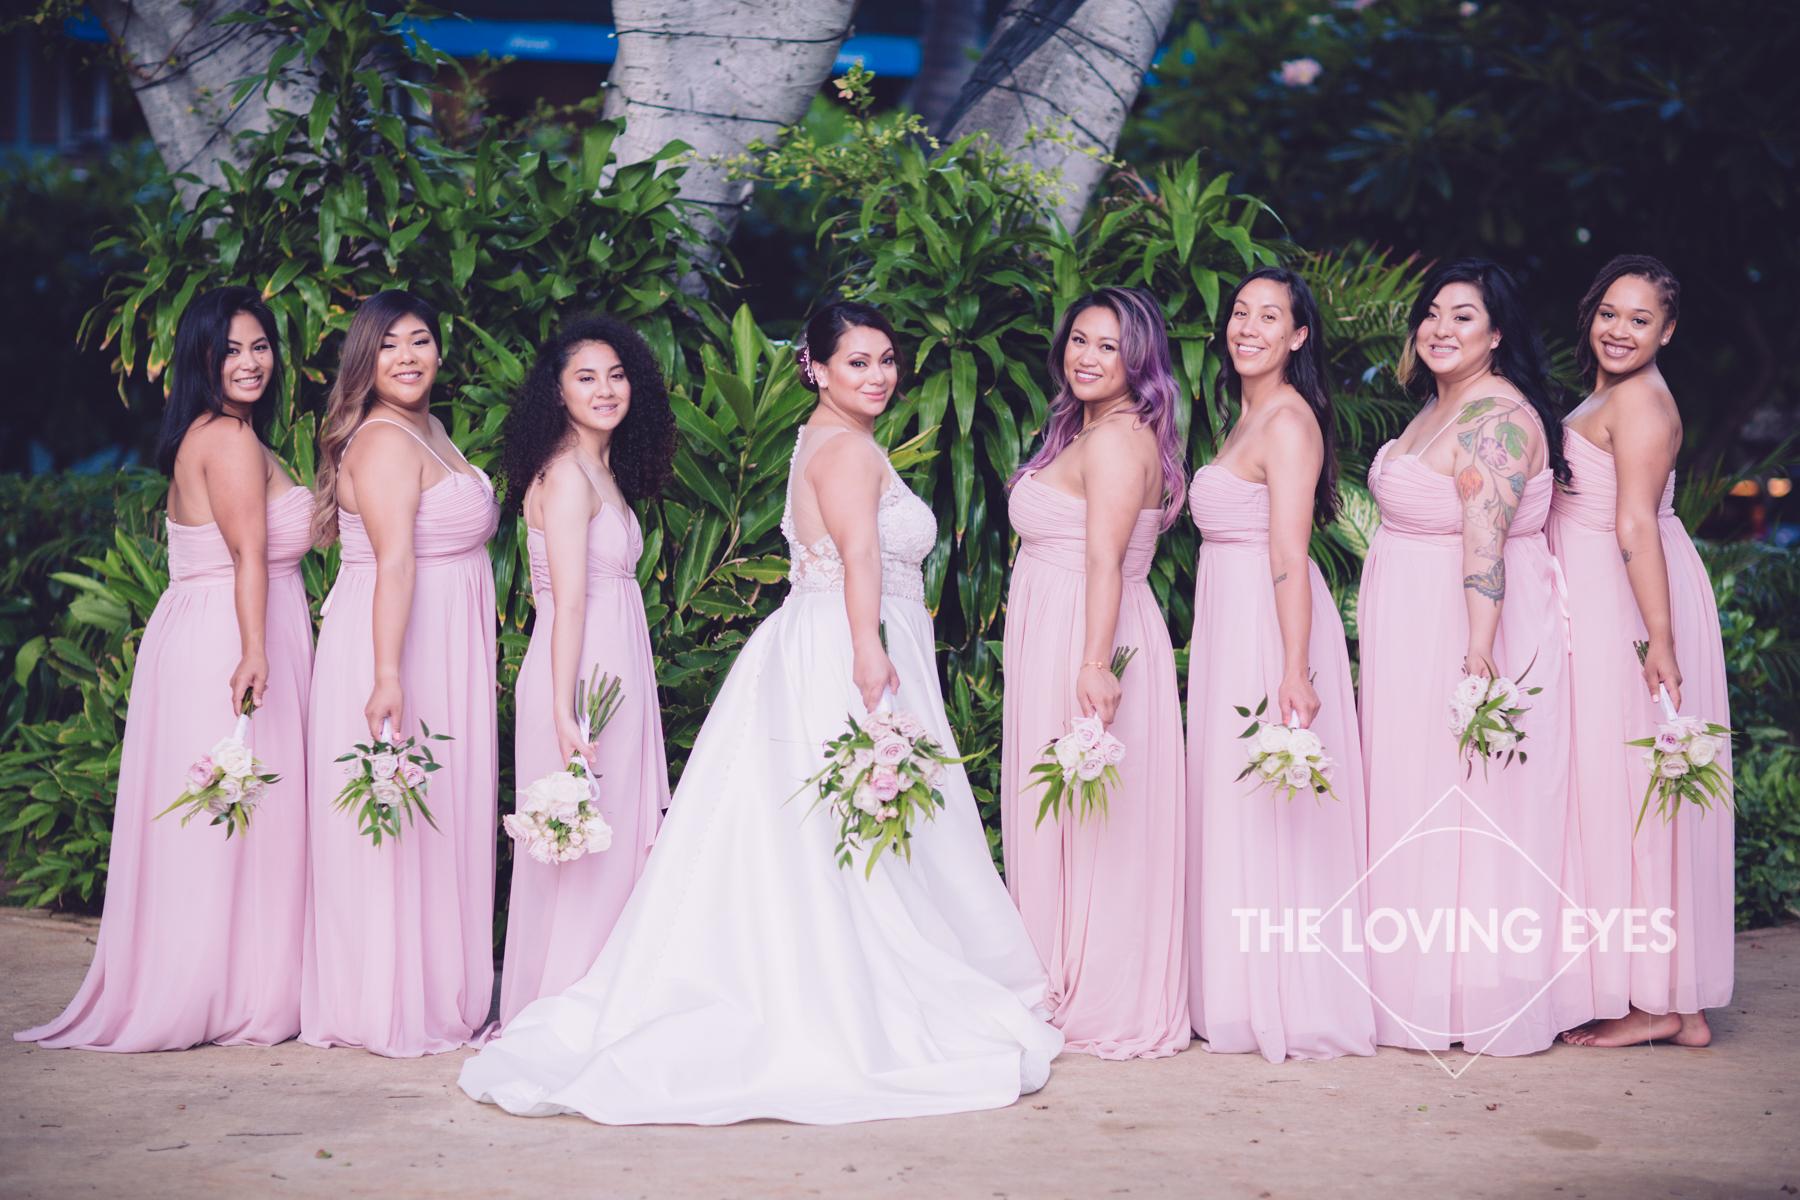 Bride and Bridesmaids on wedding day at Hilton Hawaiian Village Rainbow Suite in Waikiki